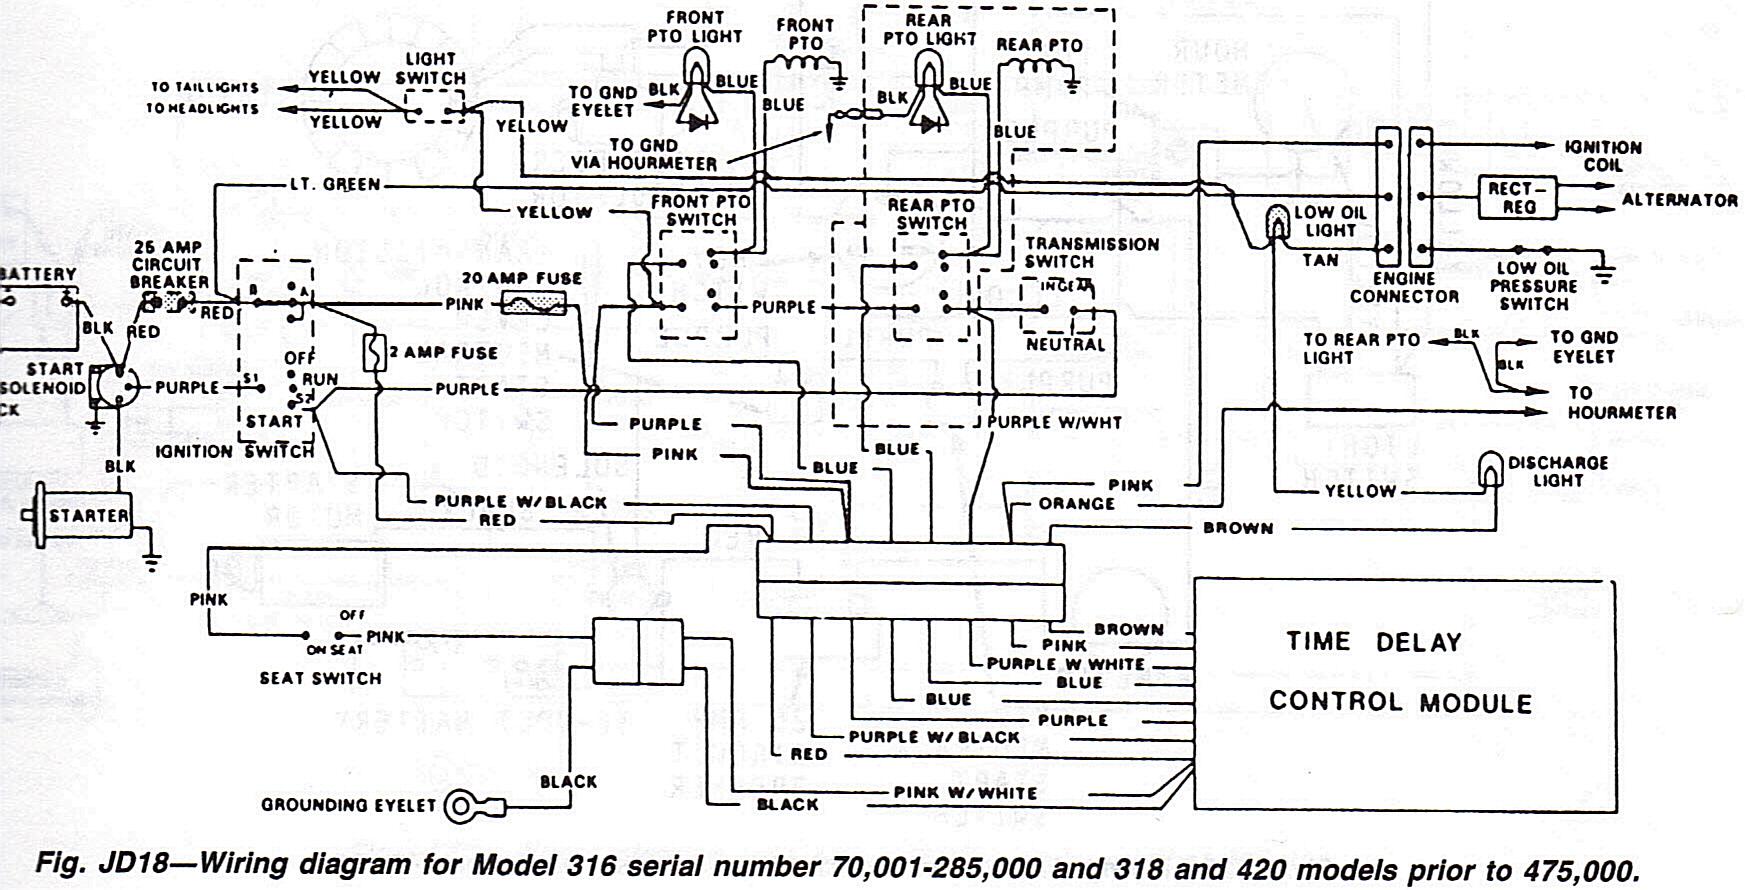 John Deere 318 voltage issues | My Tractor Forum on x465 john deere wiring diagram, lt180 john deere wiring diagram, z225 john deere wiring diagram, lx277 john deere wiring diagram, x485 john deere wiring diagram, lt160 john deere wiring diagram, sst15 john deere wiring diagram, lt155 john deere wiring diagram, z425 john deere wiring diagram,